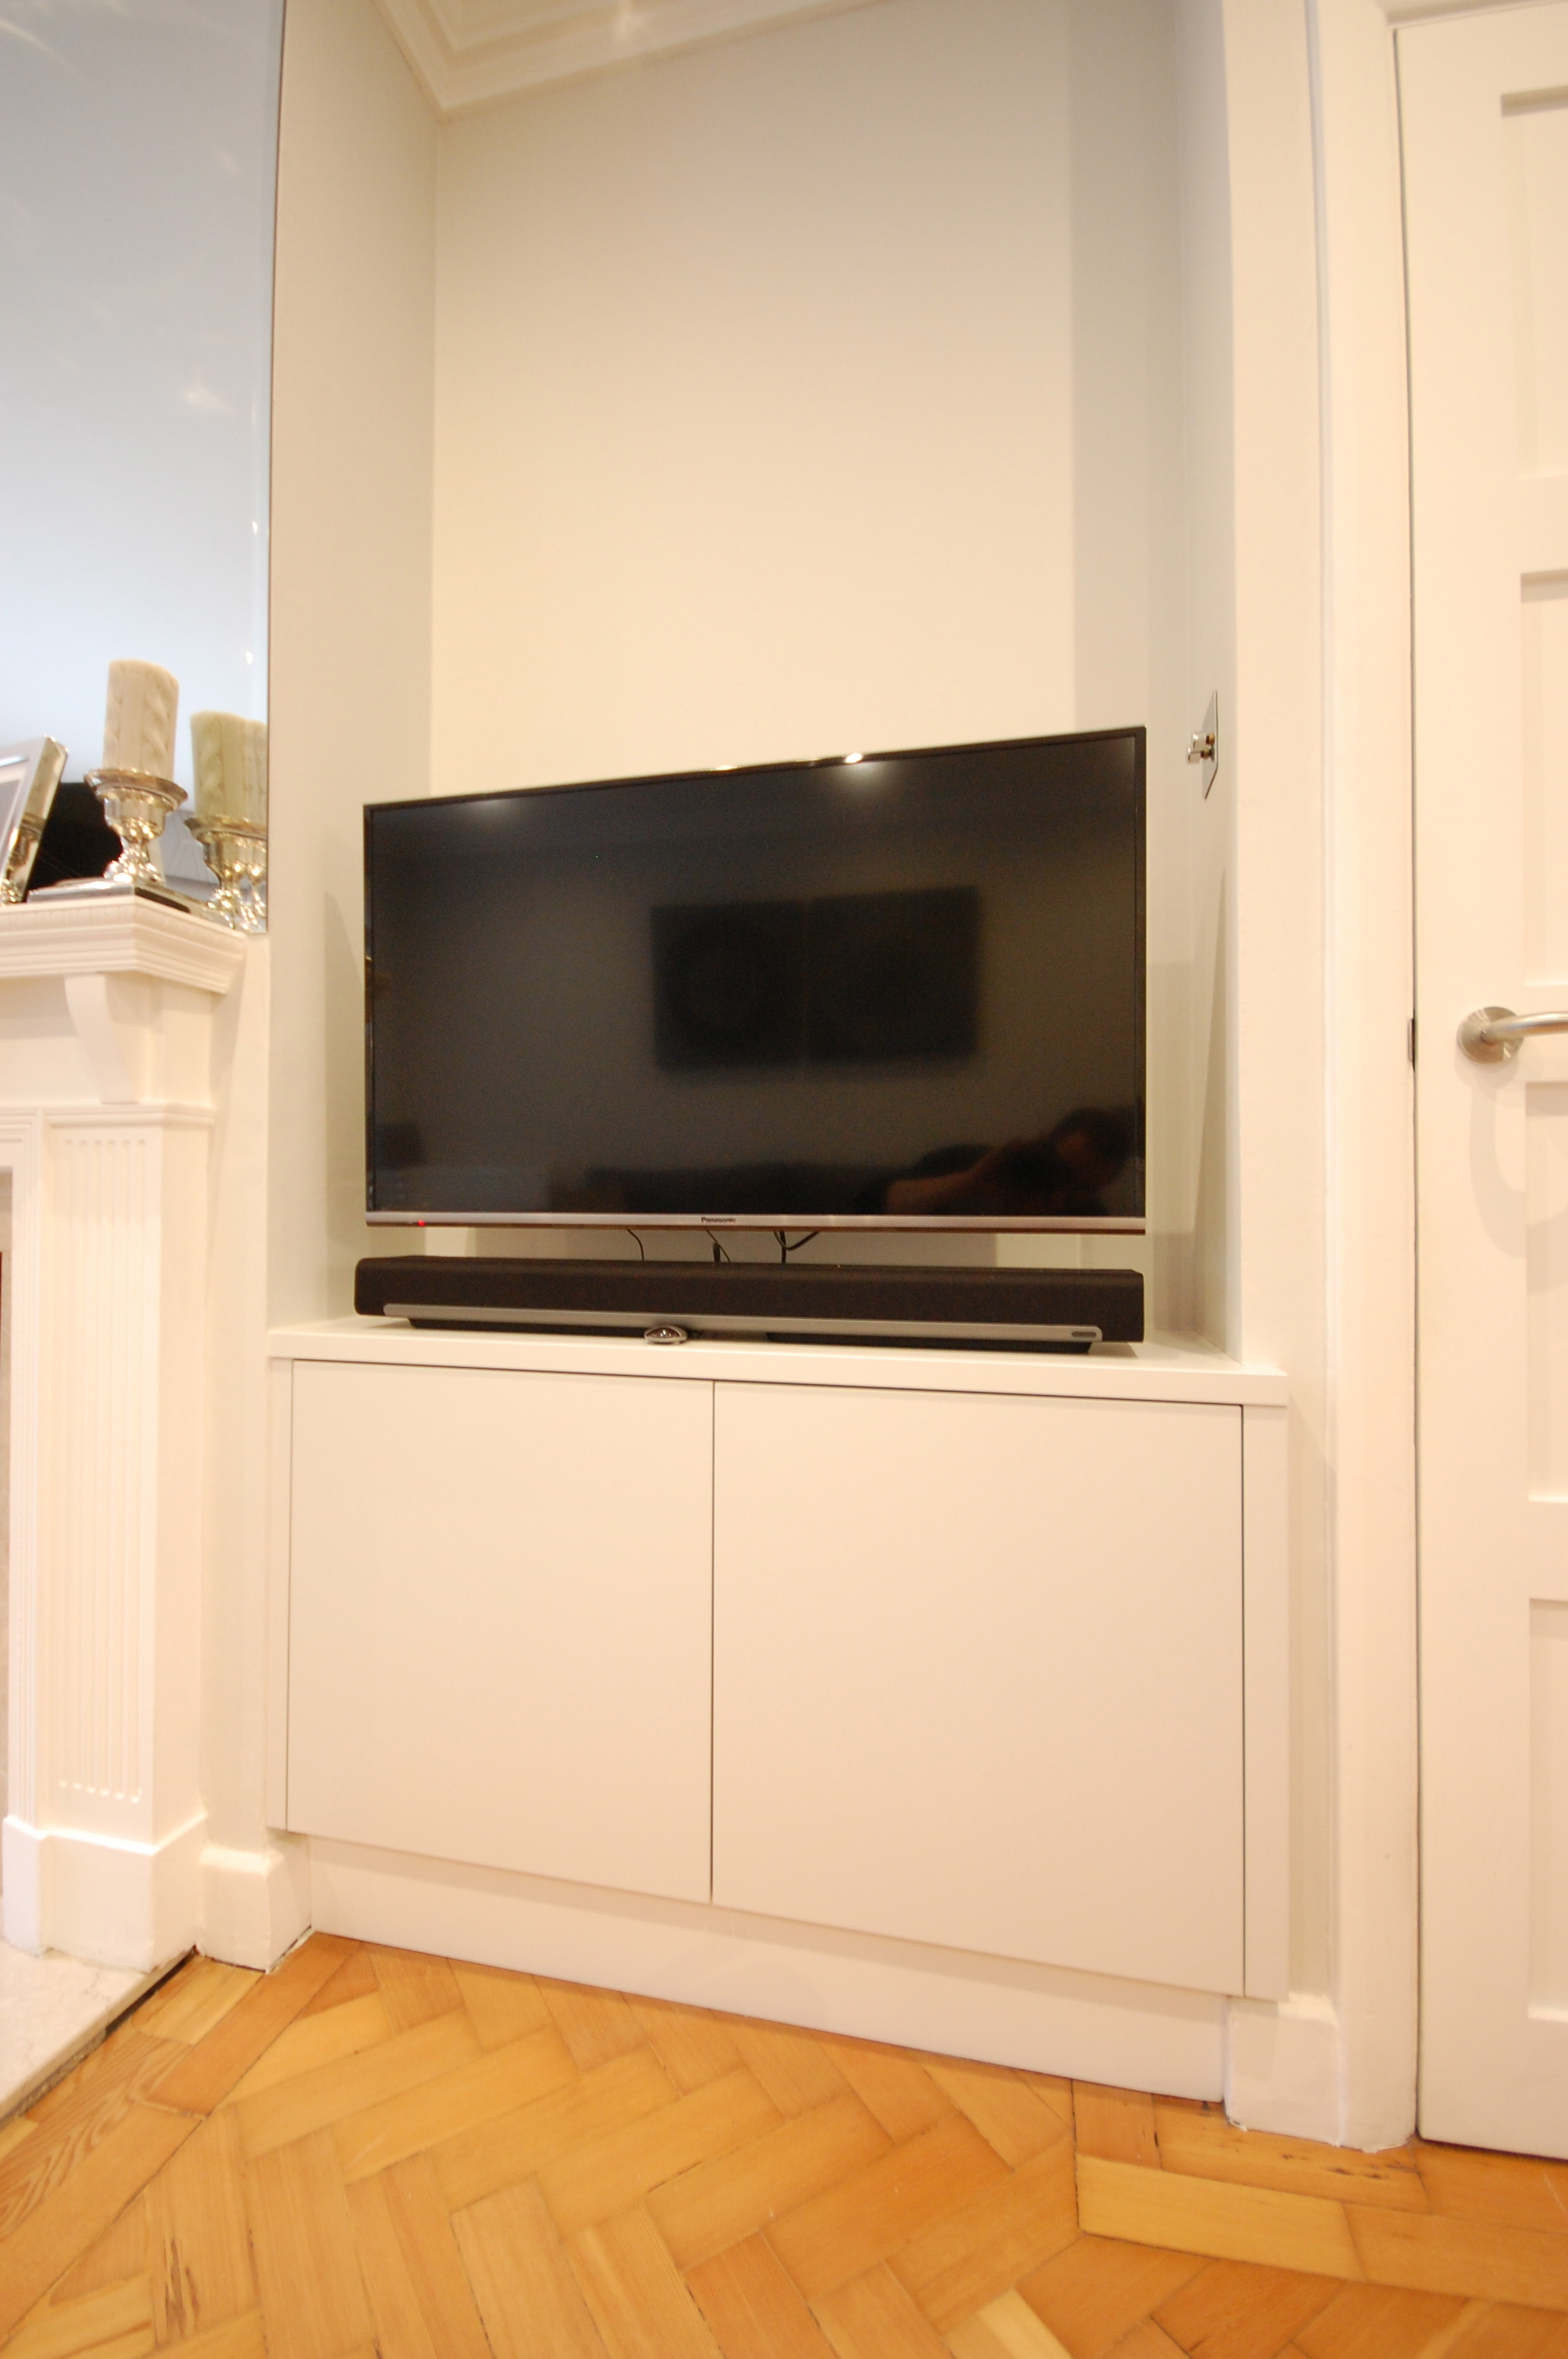 Grain_Bespoke_Furniture_White_Sprayed_Cabinet_2.jpg